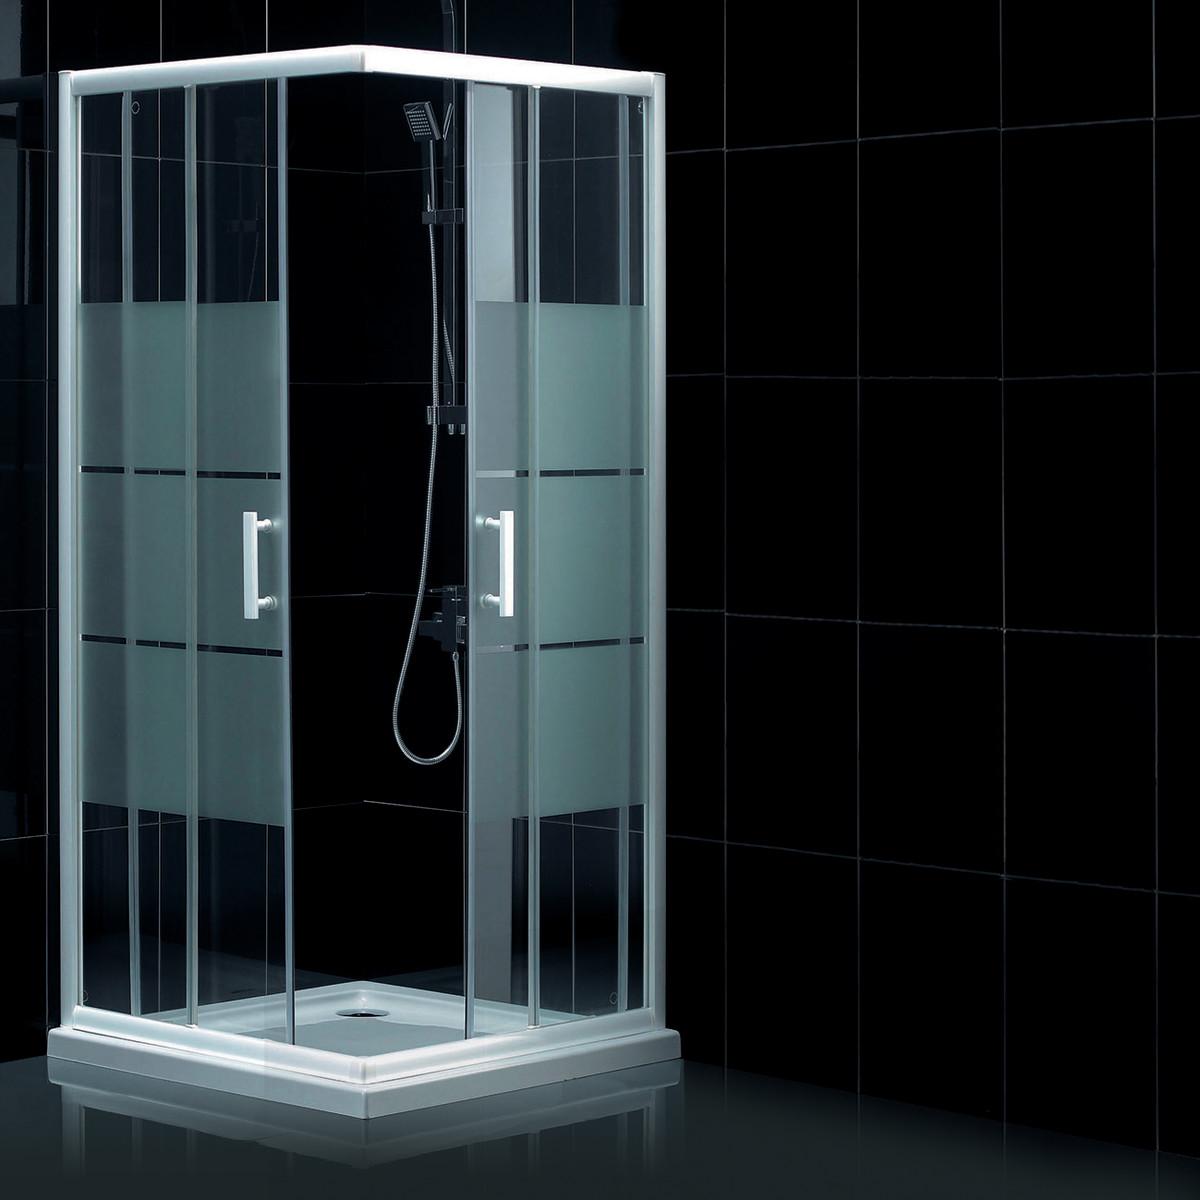 Prezzi box doccia leroy merlin leroy merlin lampadario - Prezzi sanitari bagno leroy merlin ...